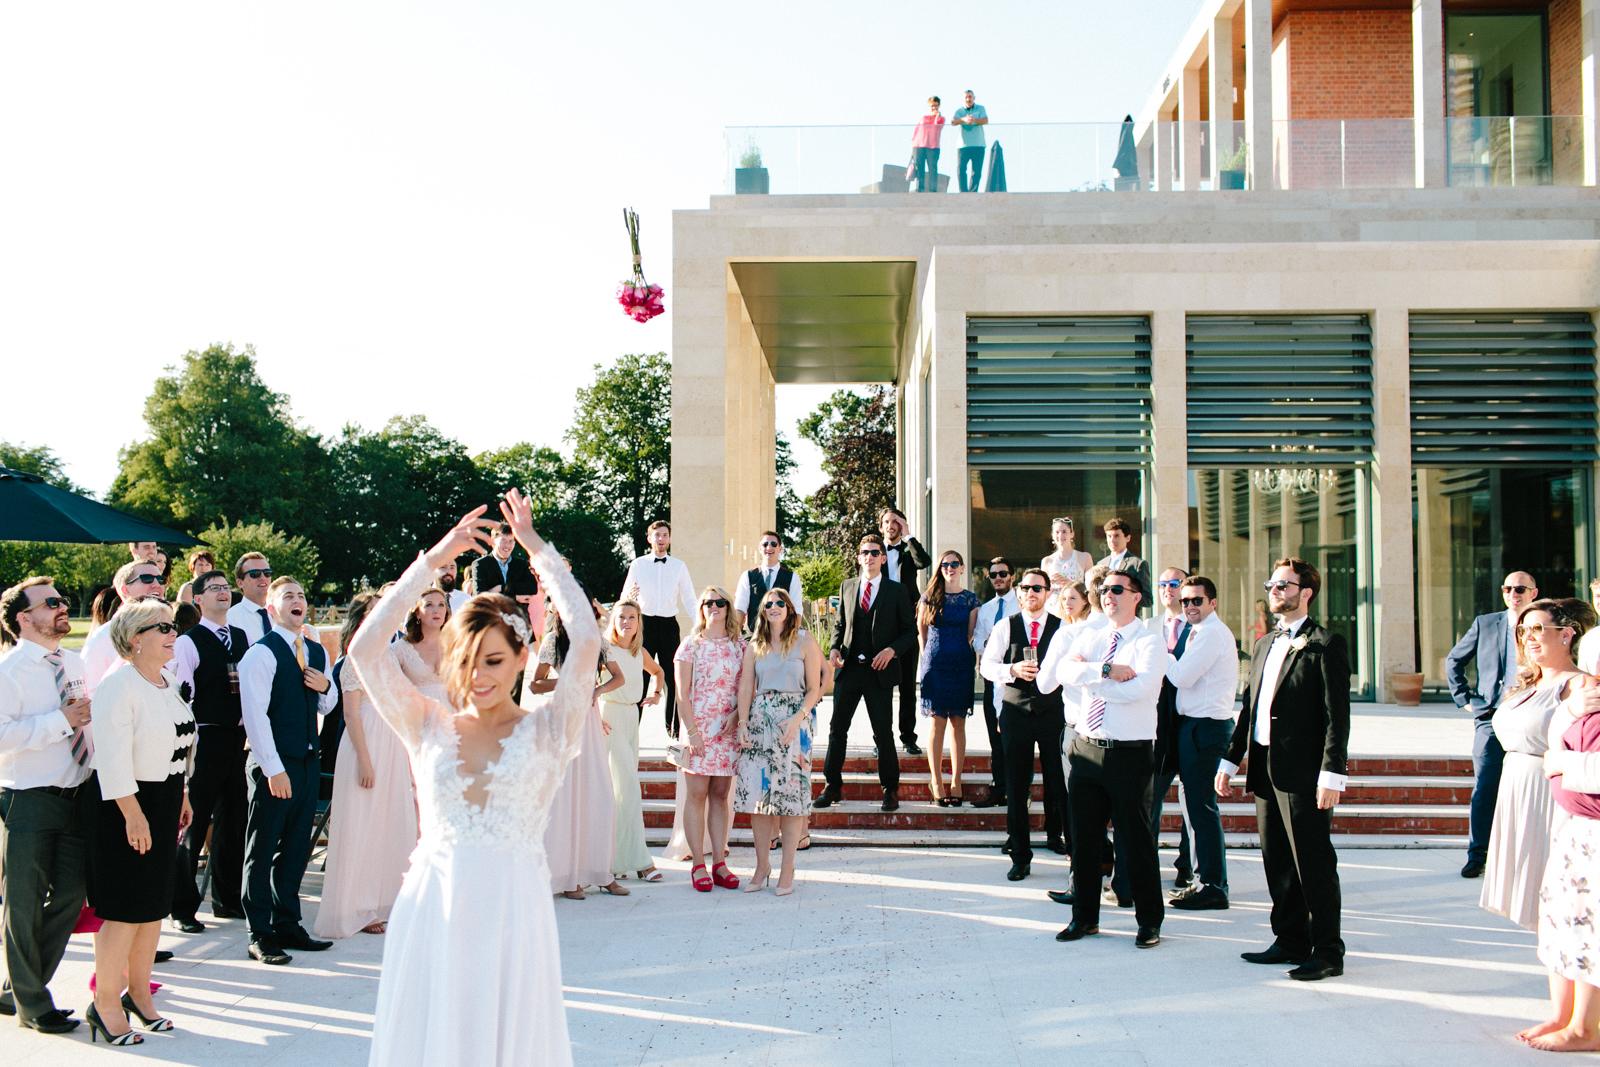 Stanbrooke Abbey Wedding Photographer-322616.jpg